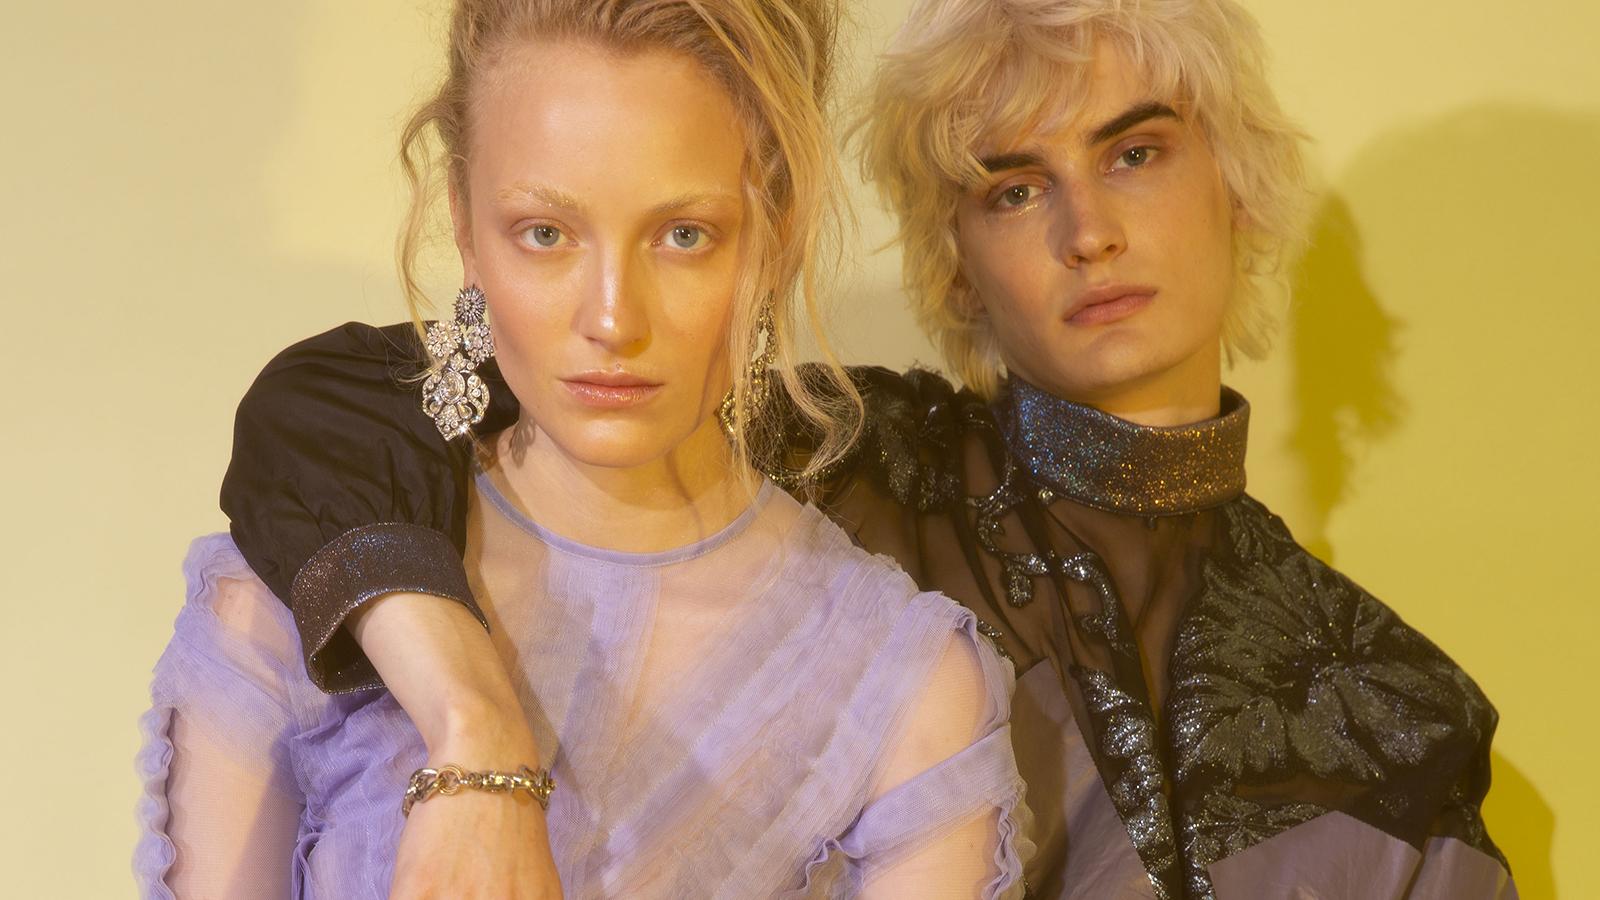 Avocational level course in Fashion Styling, Image & Photography – Курс фэшн-стайлингу, имиджу и фотографии (3 недели) в США